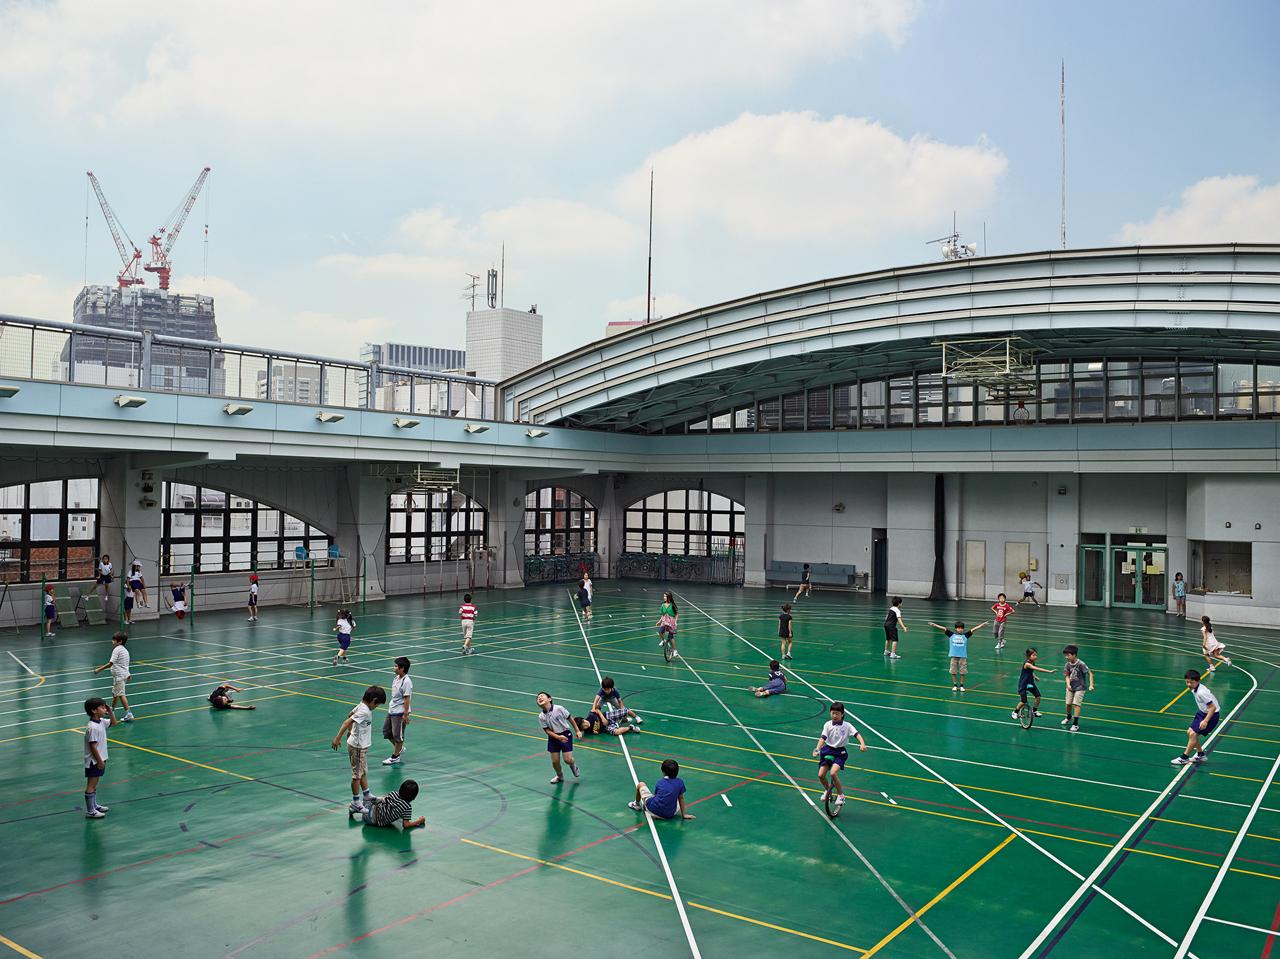 JAMES MOLLISON,  Shohei Elementary School, Tokyo, Japan , September 8, 2011